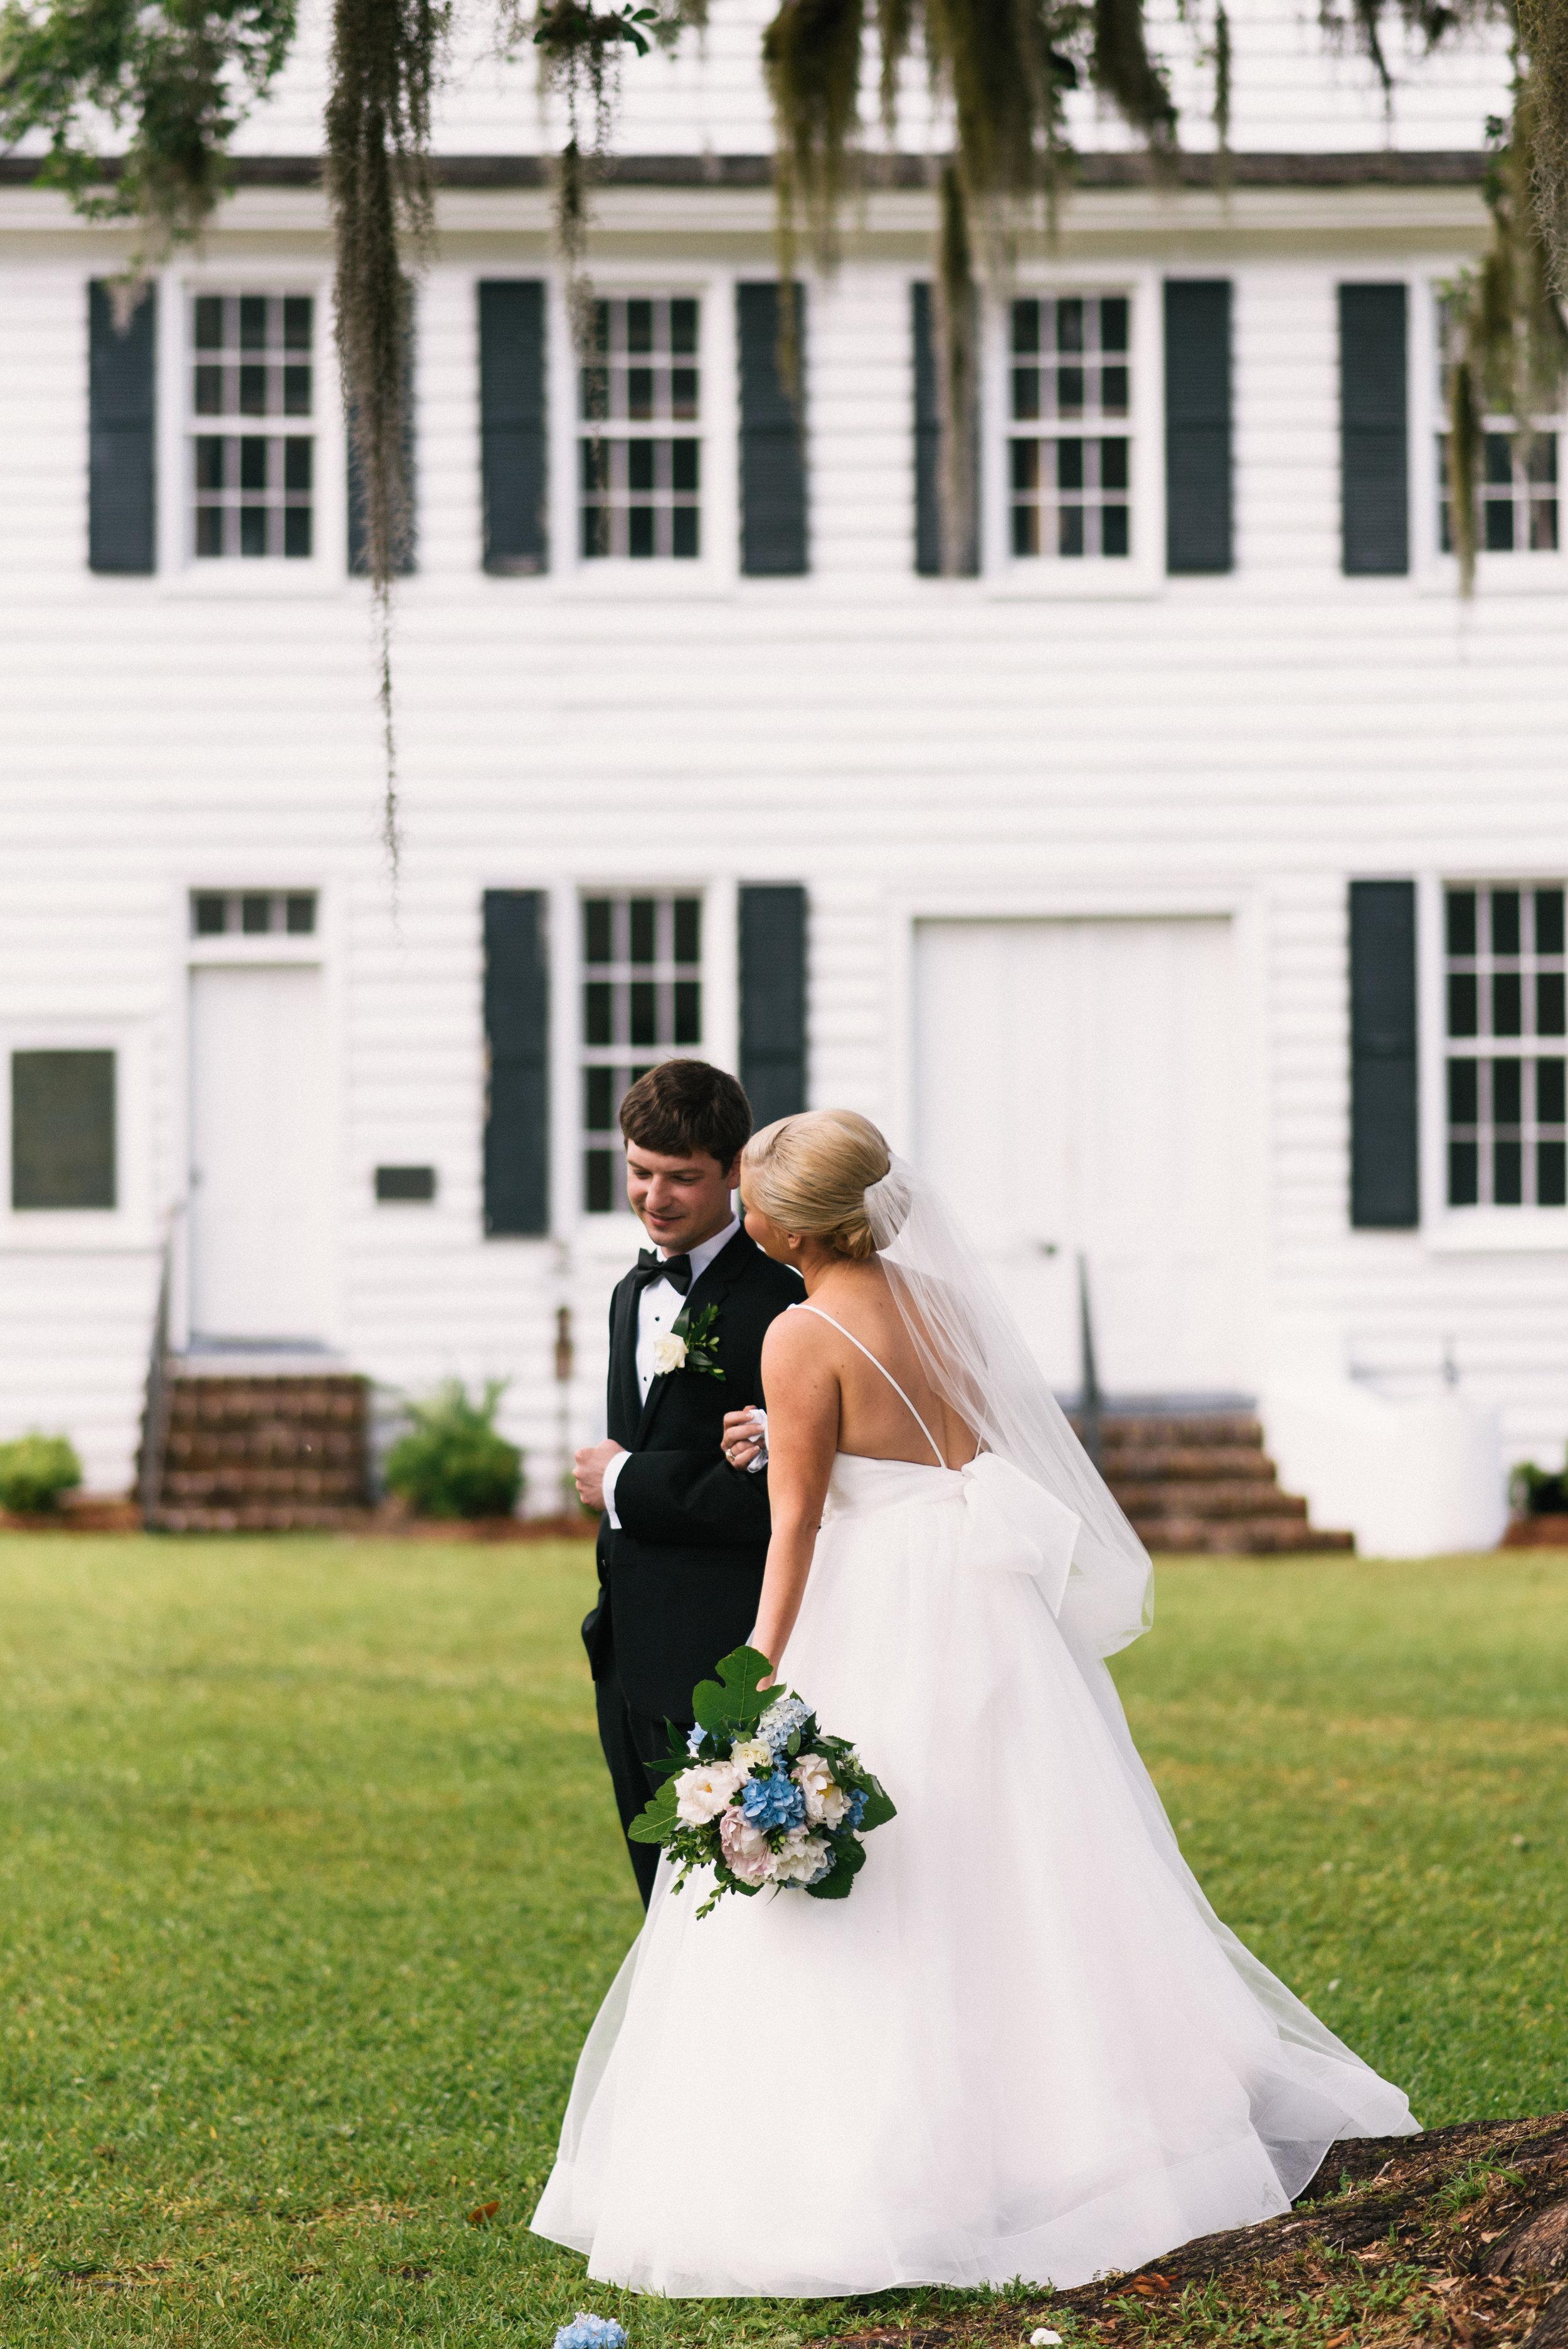 ali-and-jared-savannah-georgia-may-2017-wedding-meg-hill-photo-(462of760).jpg